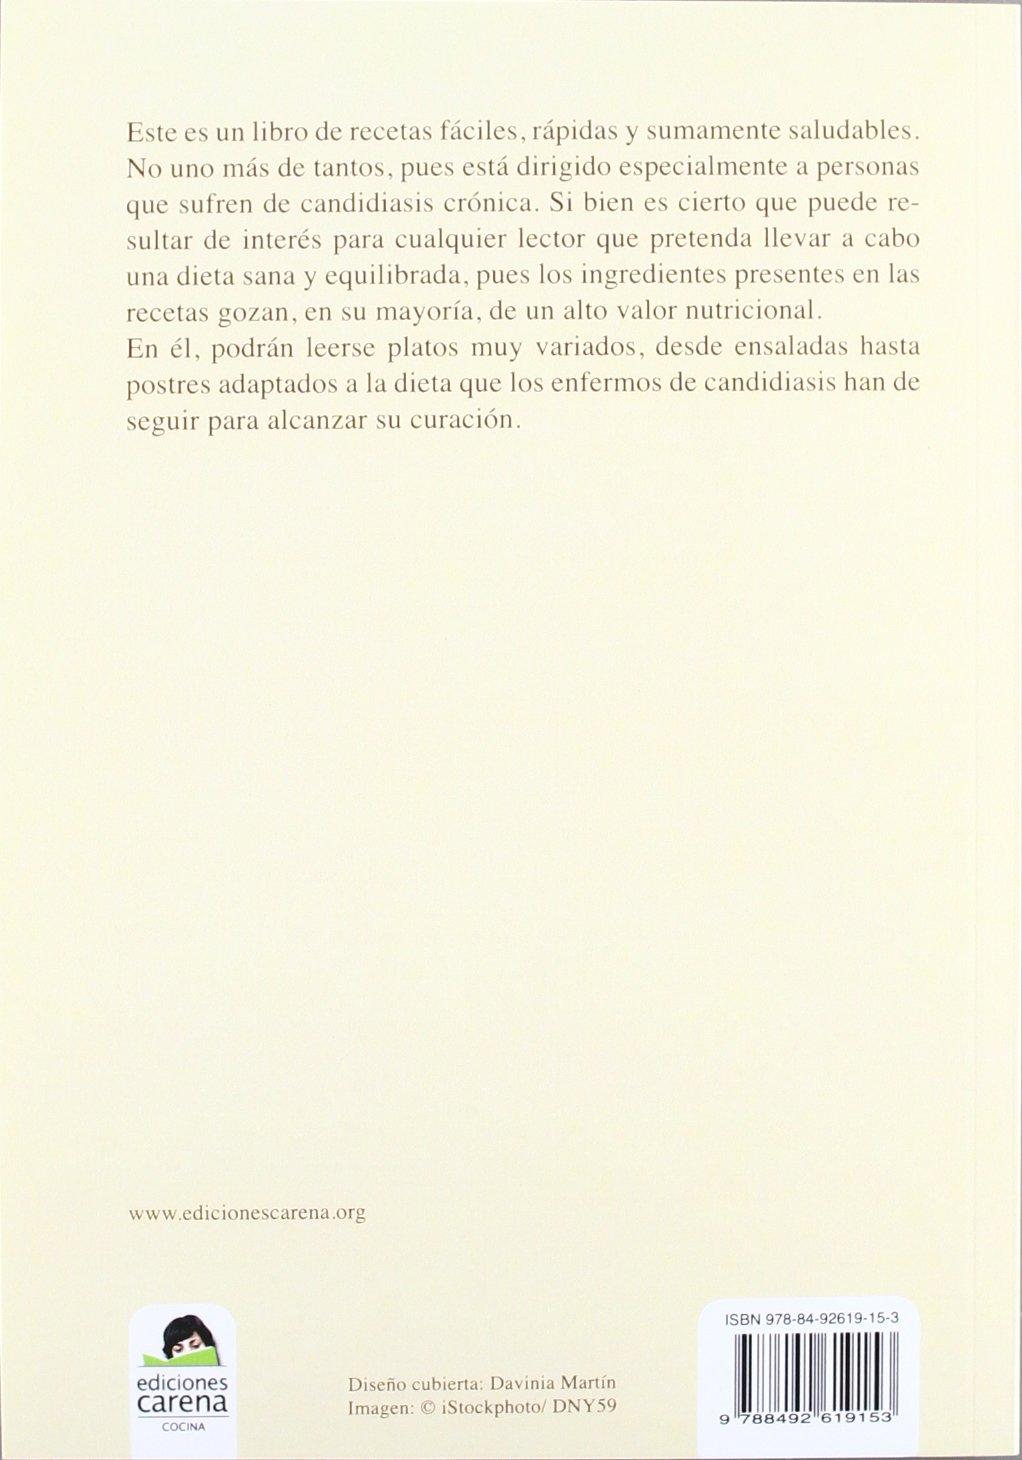 Recetas Para Personas Con Candidiasis (Ensayo): Amazon.es: Asociación Española de Candidiasis: Libros